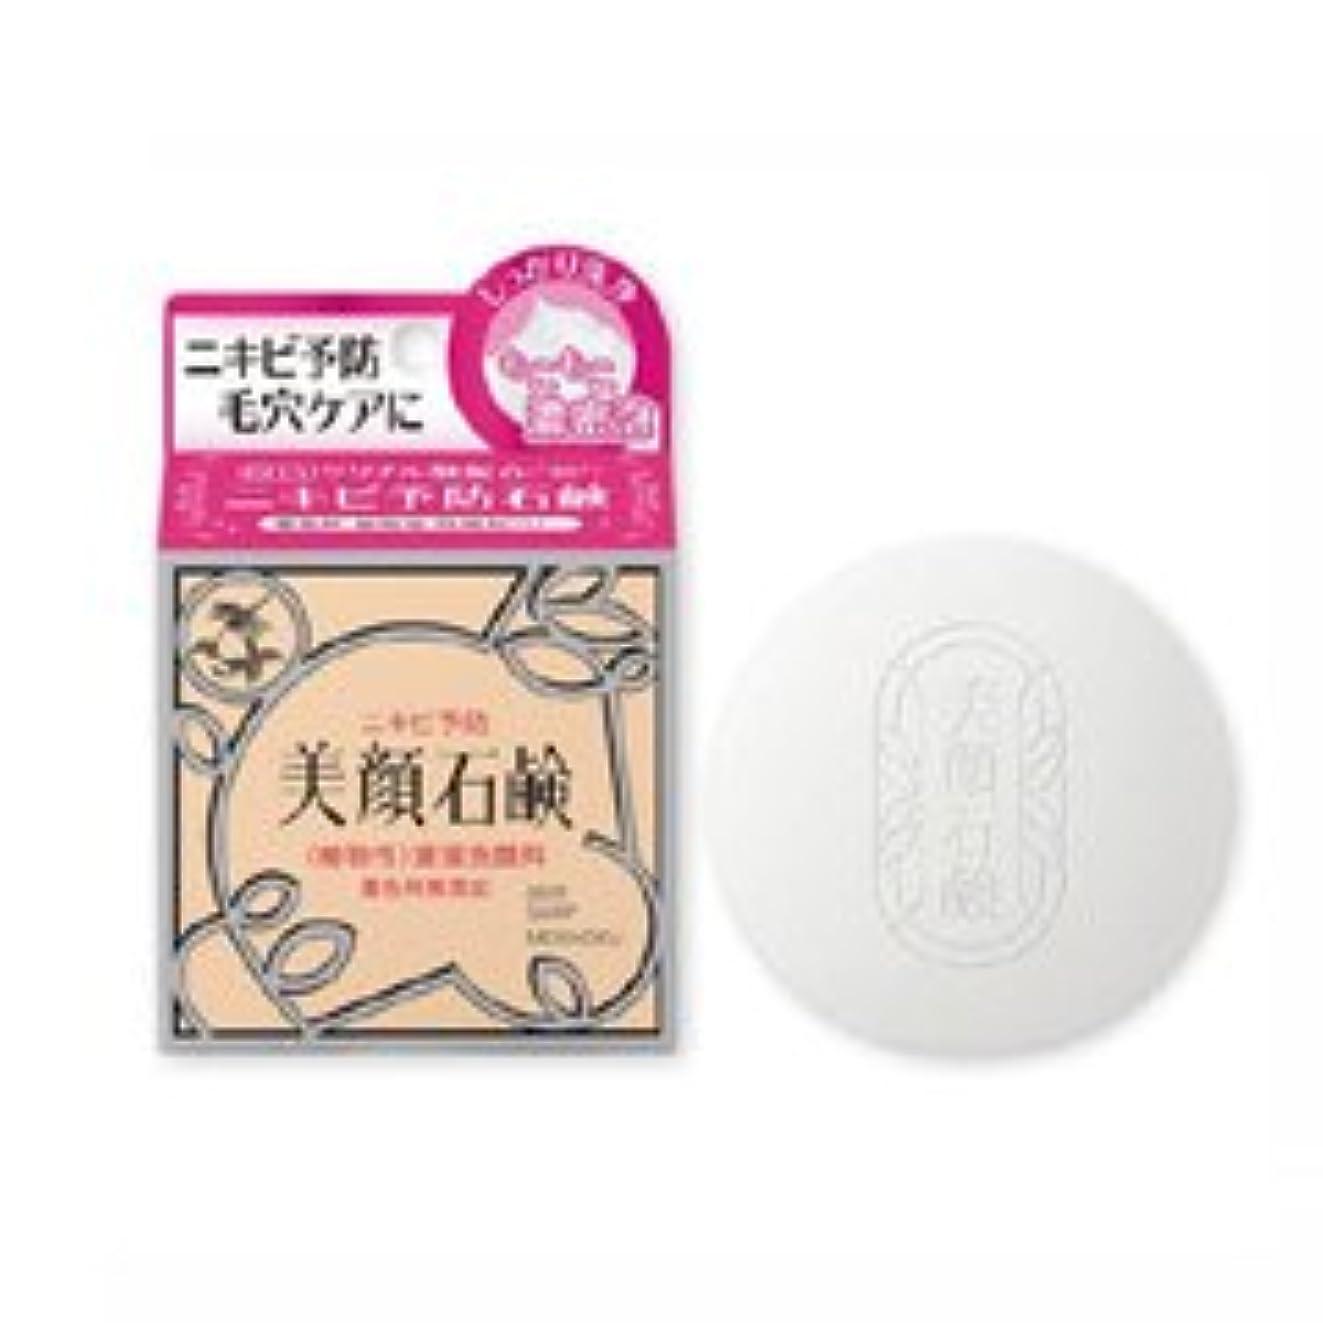 生態学絶えず称賛美顔石鹸 80g 【明色】